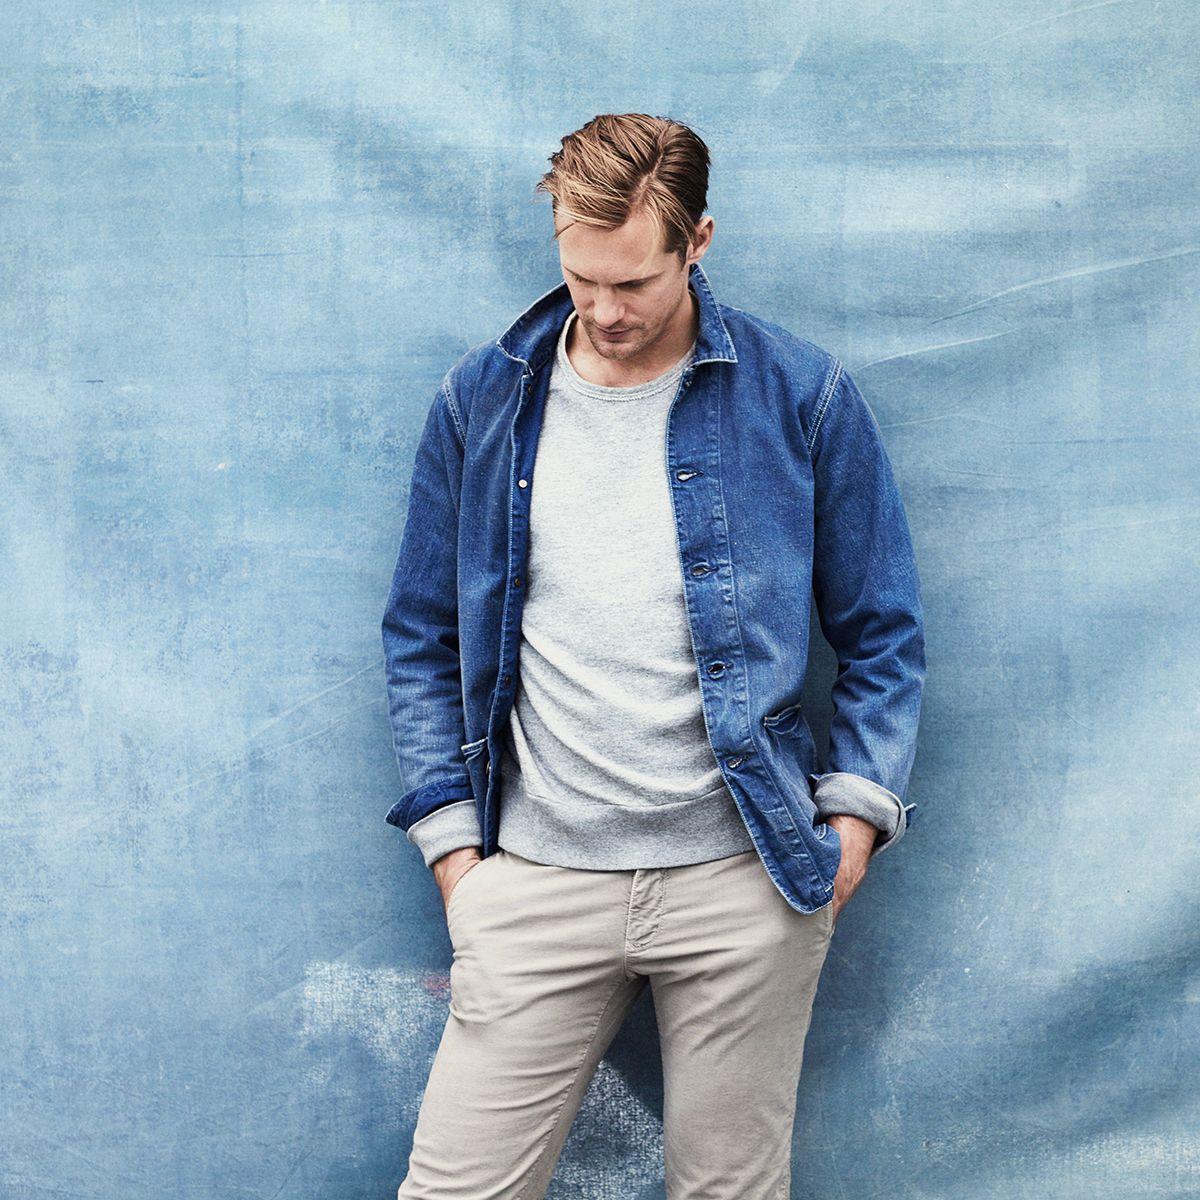 Mr Alexander Skarsgård for MR PORTER wearing Chimala Jacket, Rag & Bone Sweatshirt and Incotex Chinos.